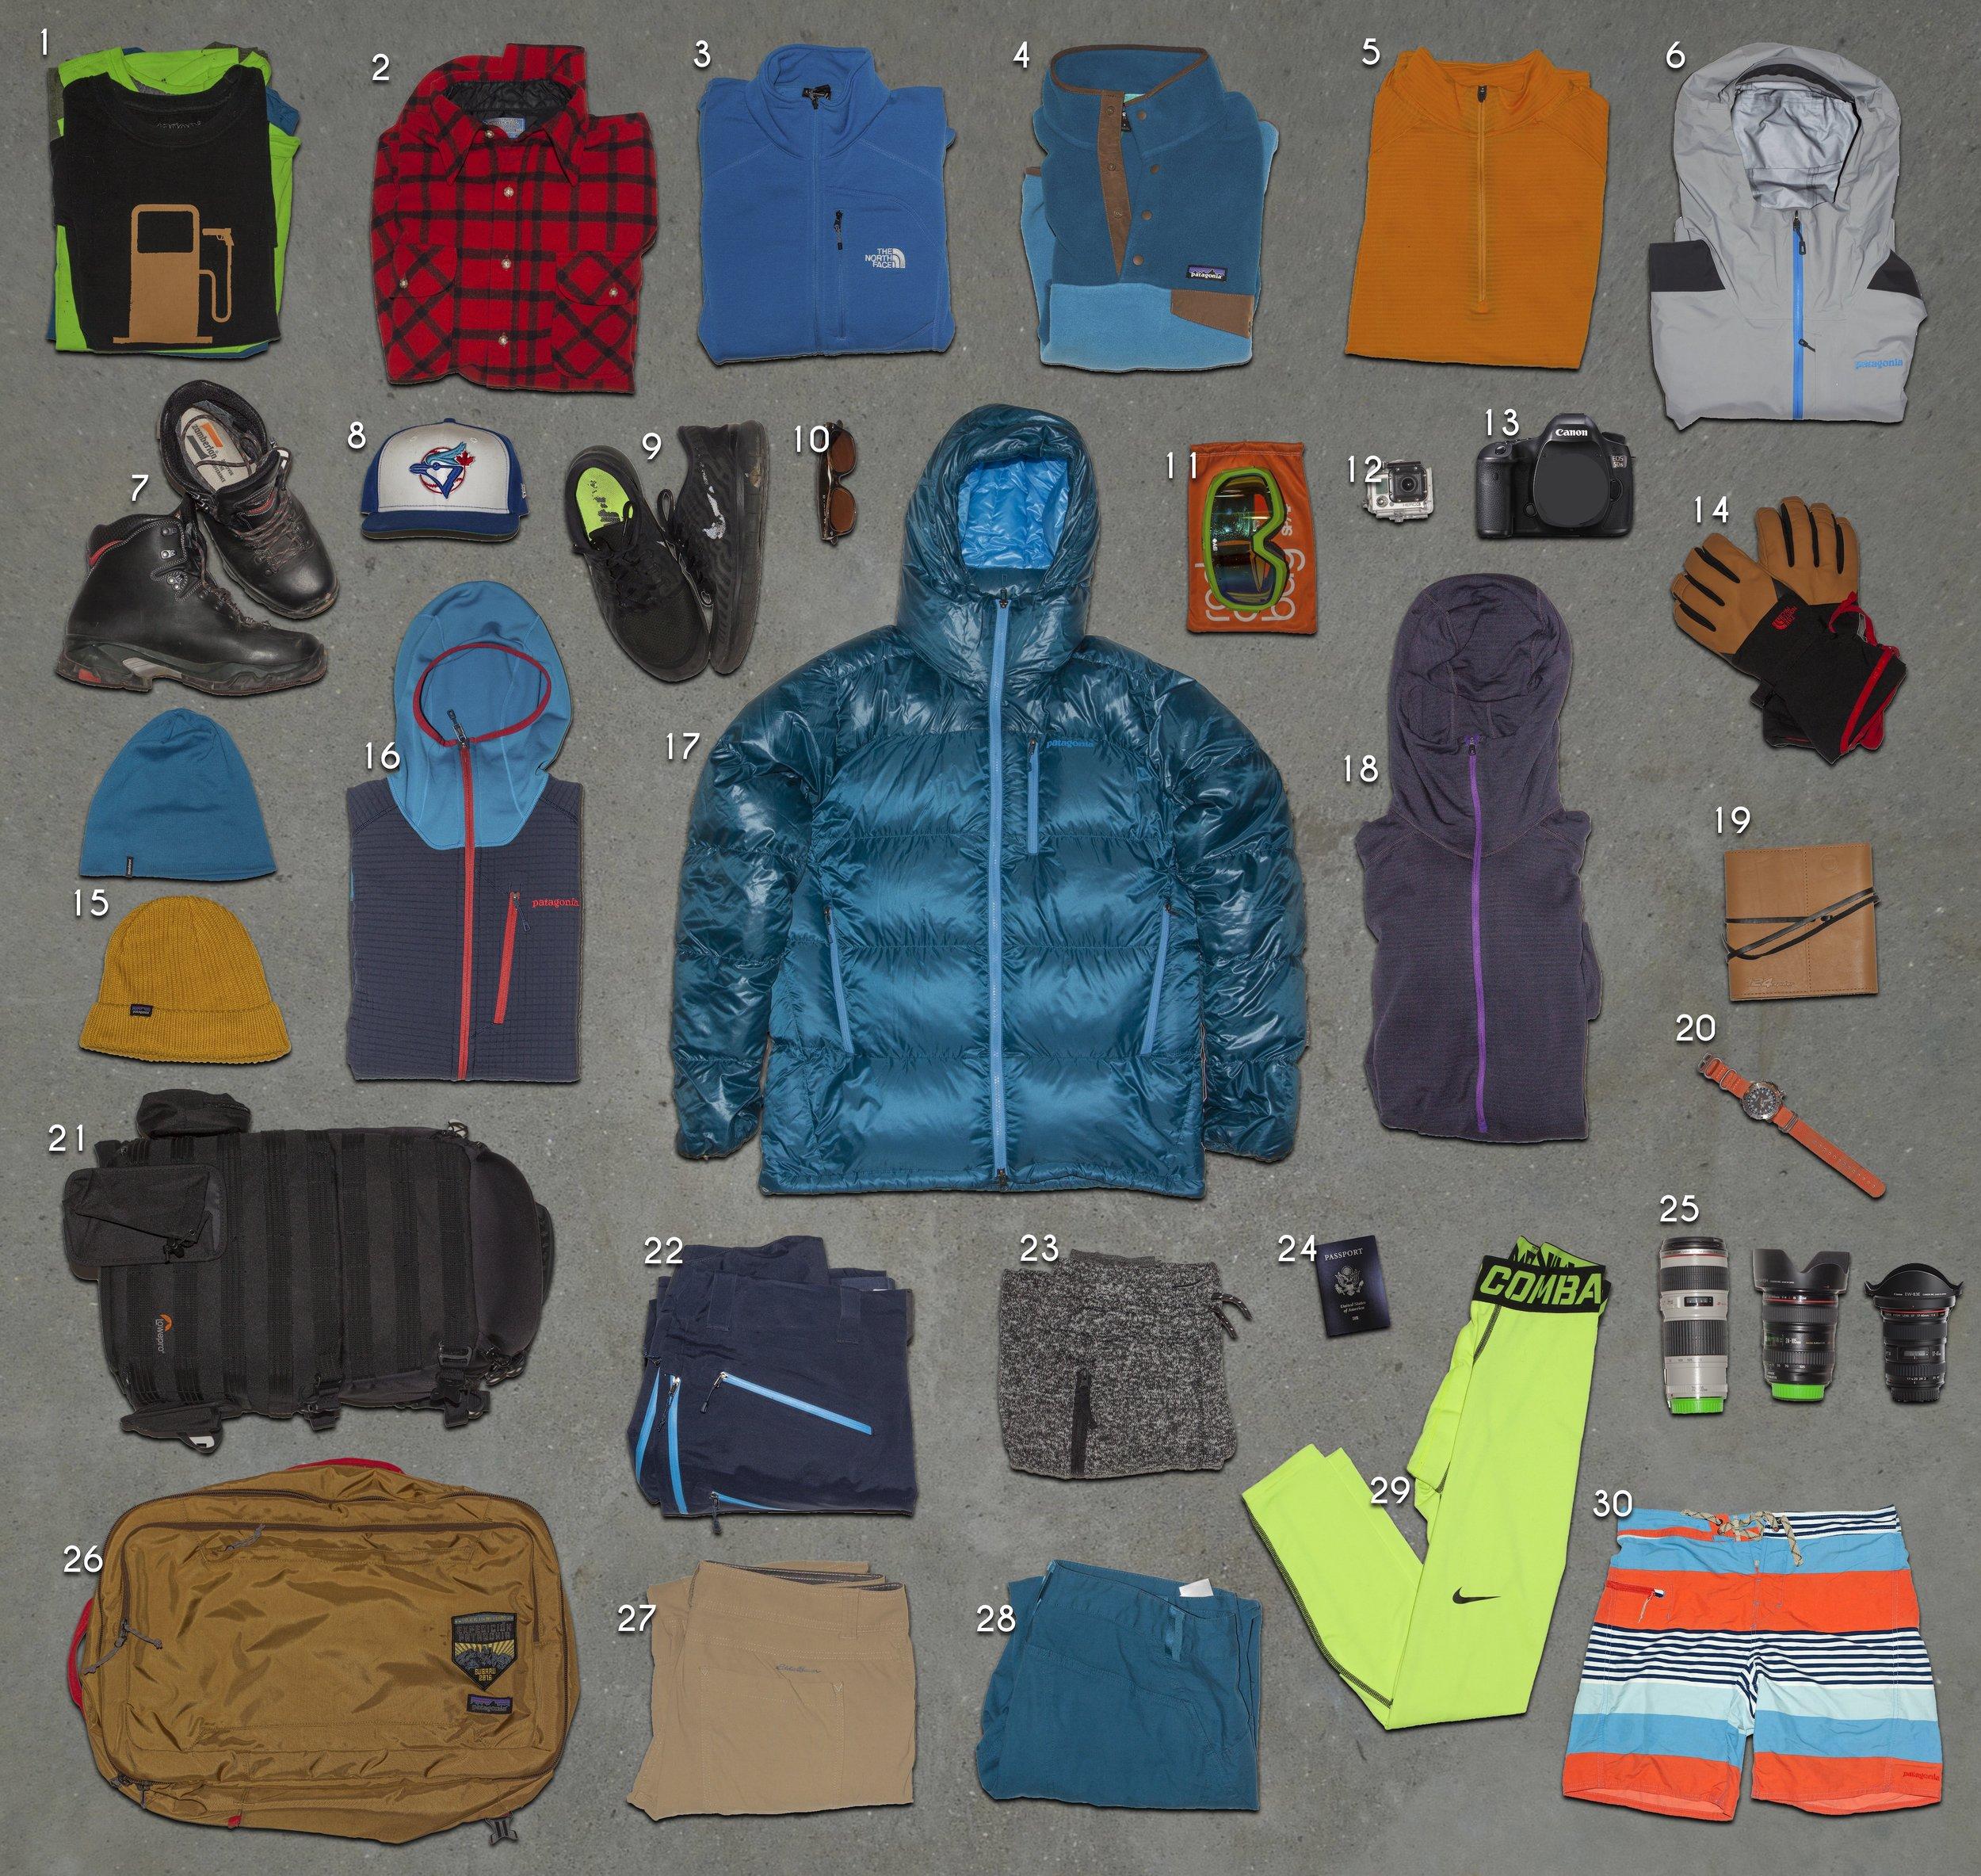 antarcticapacking